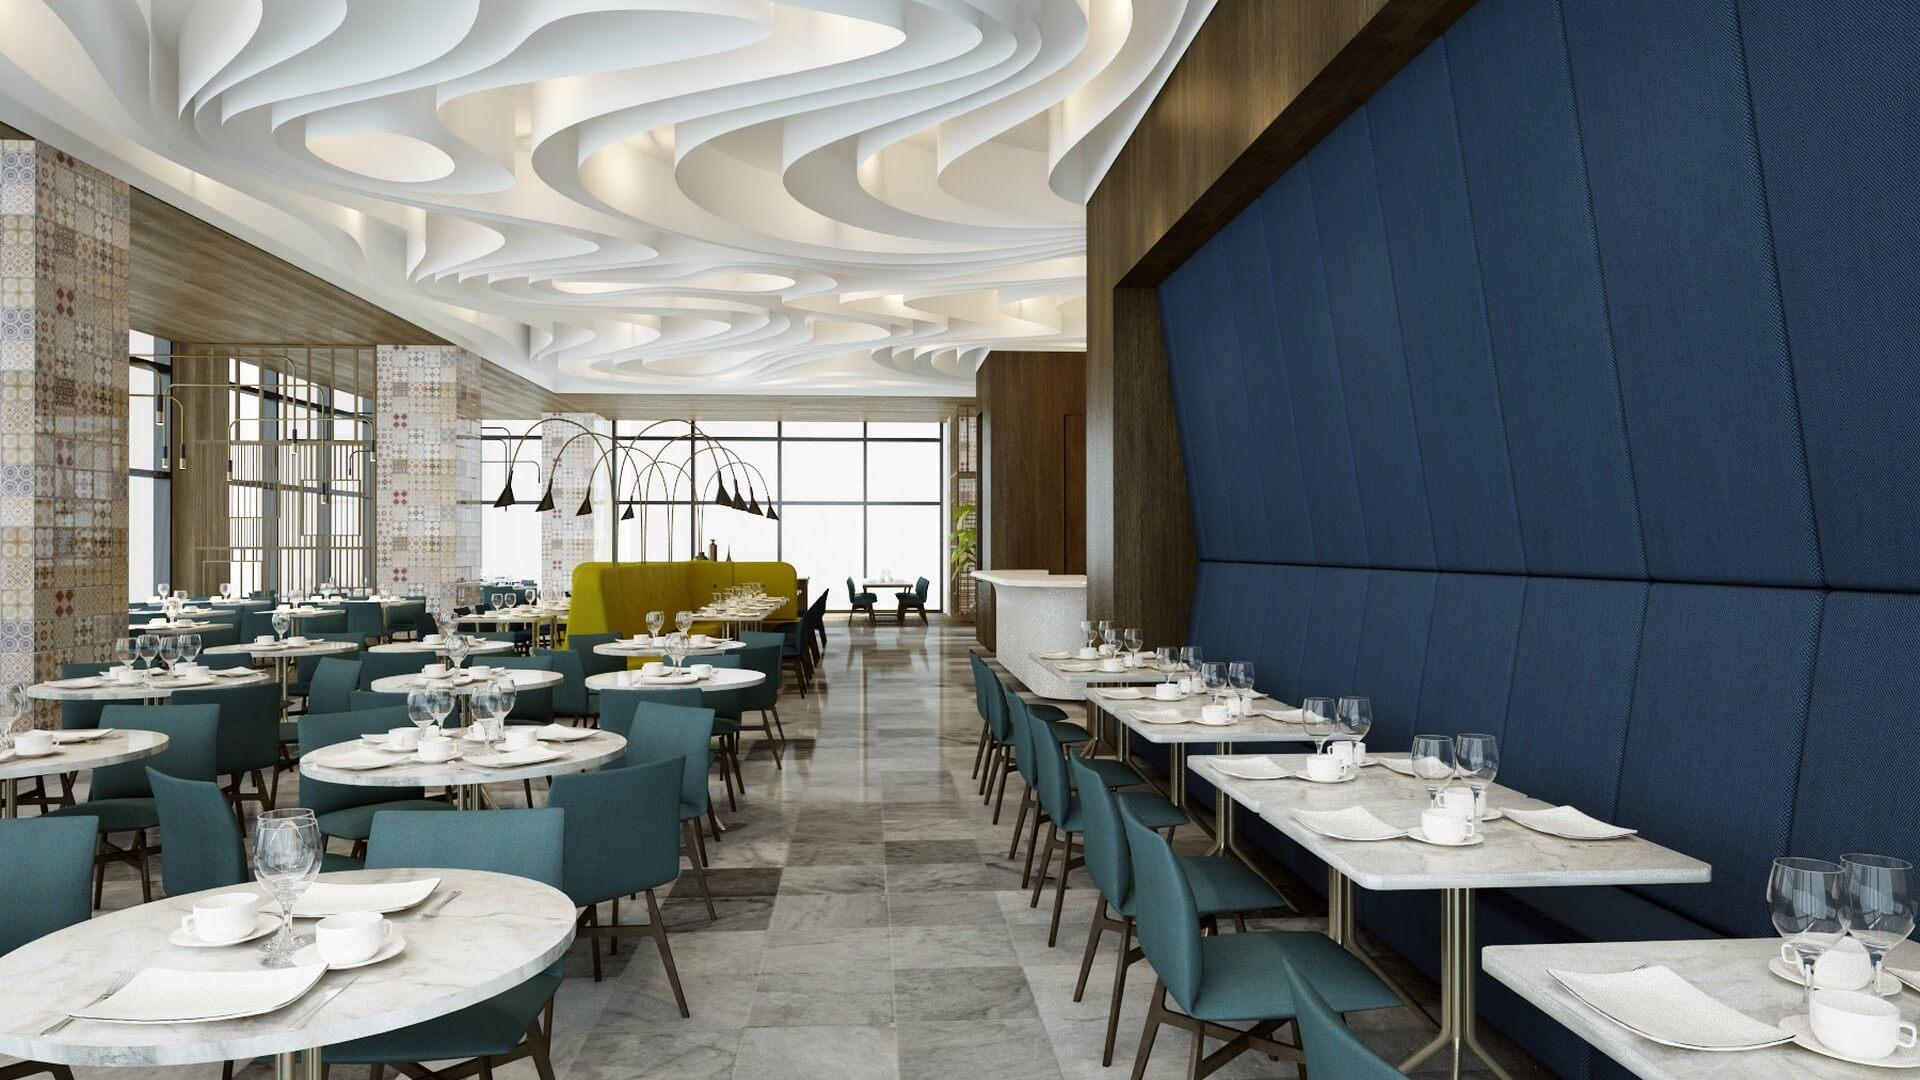 Restoran, Cafe, Fast-food Mimari Projeler Tiflis Steakhouse